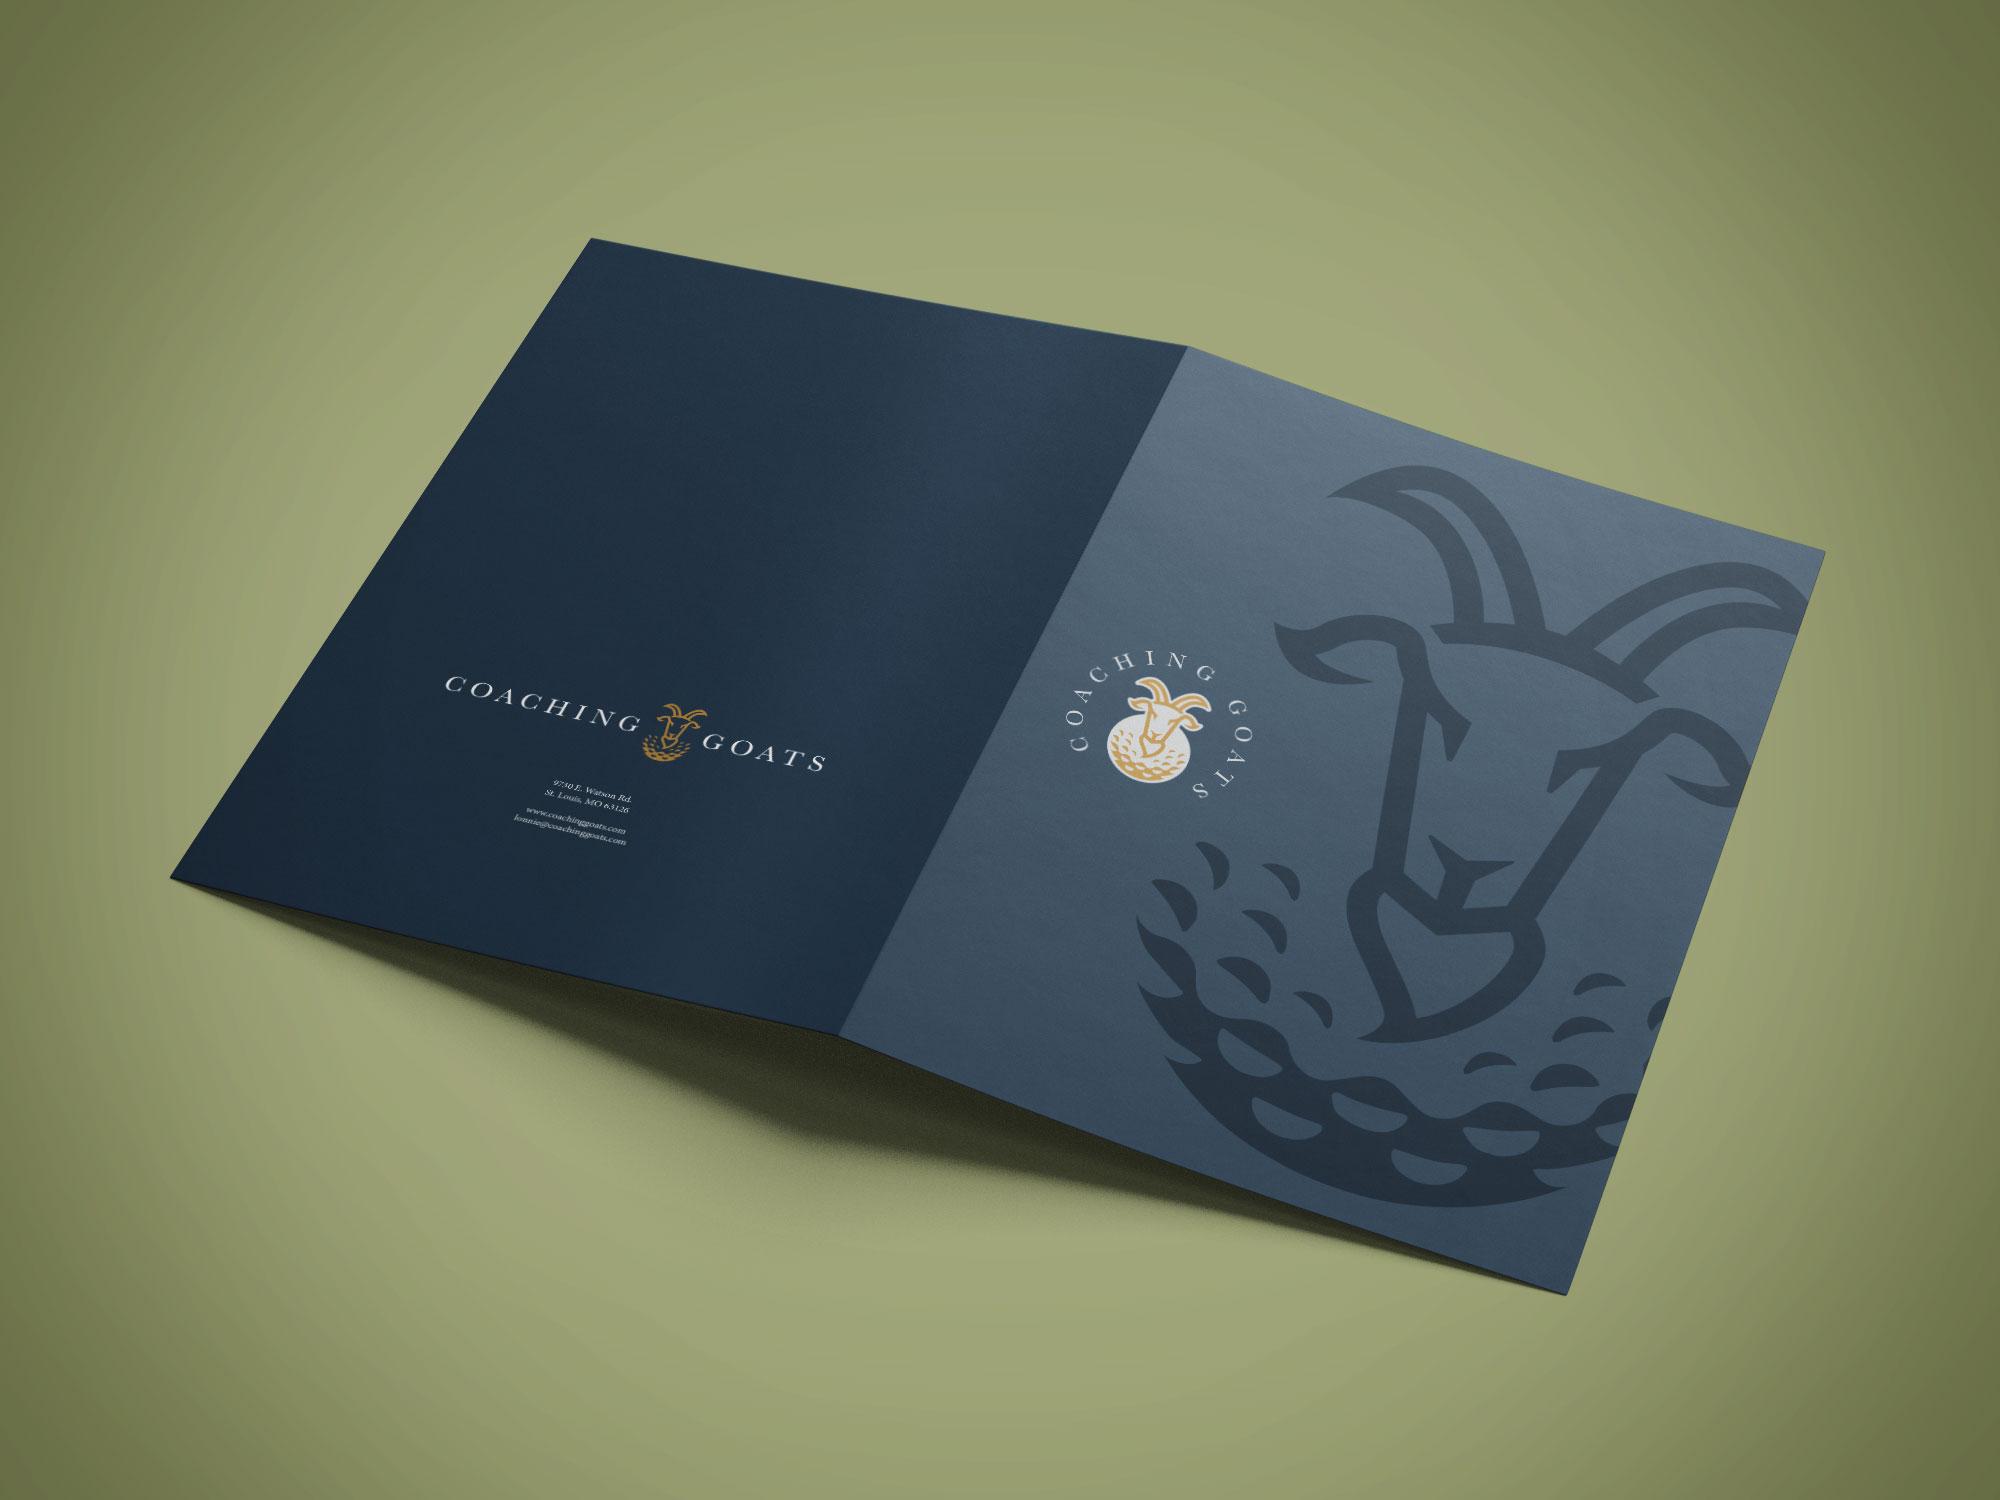 GOATS folder design